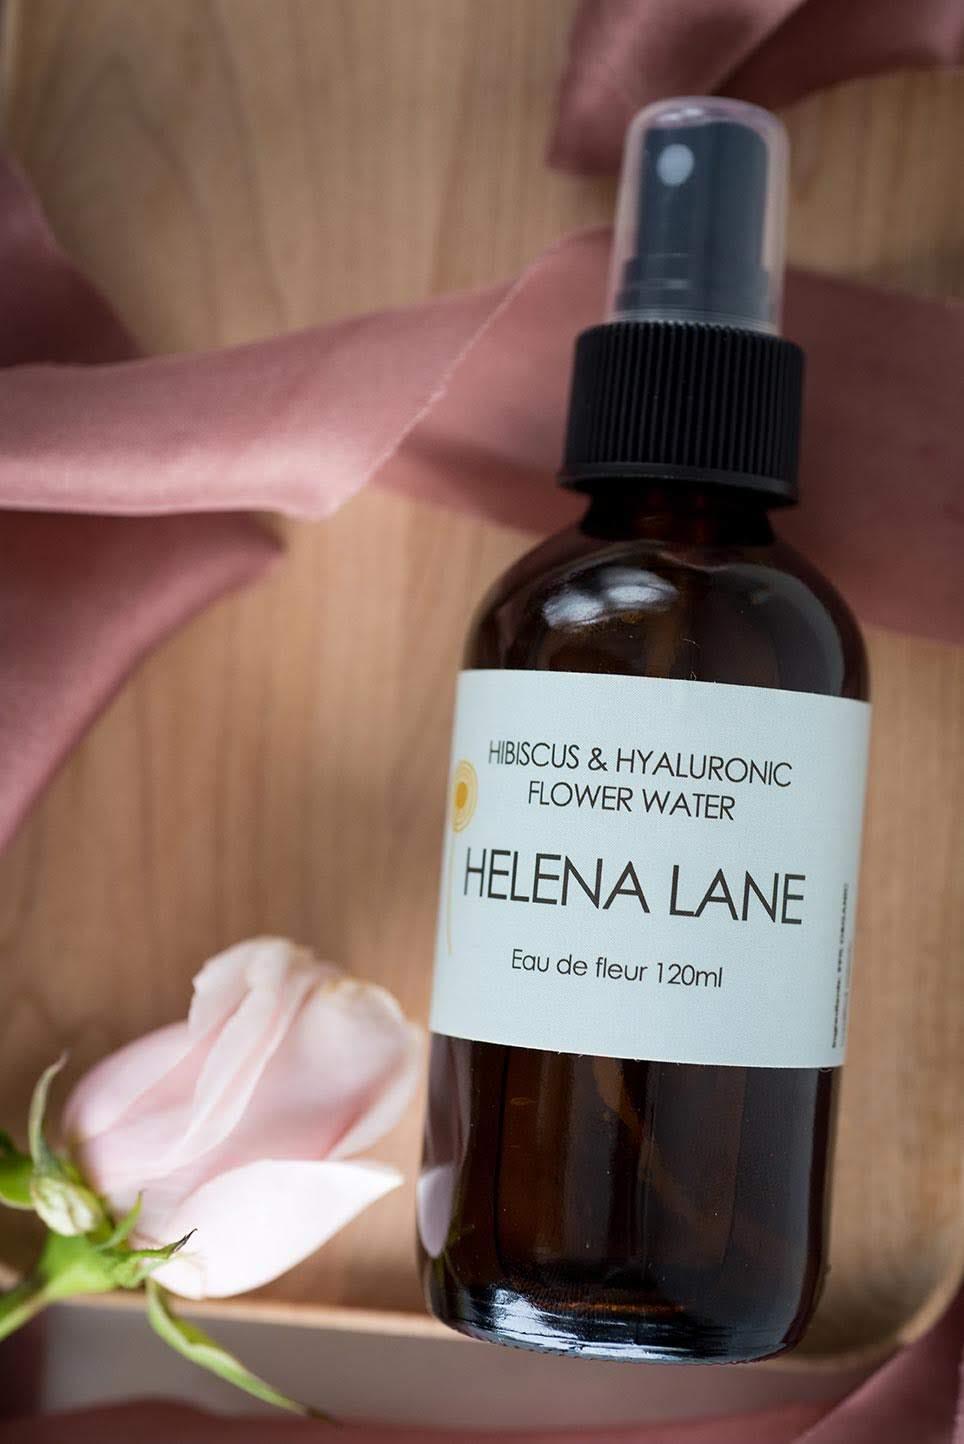 Helena Lane - Hibiscus & Hyaluronic Flower Water | Kolya Naturals, Canada